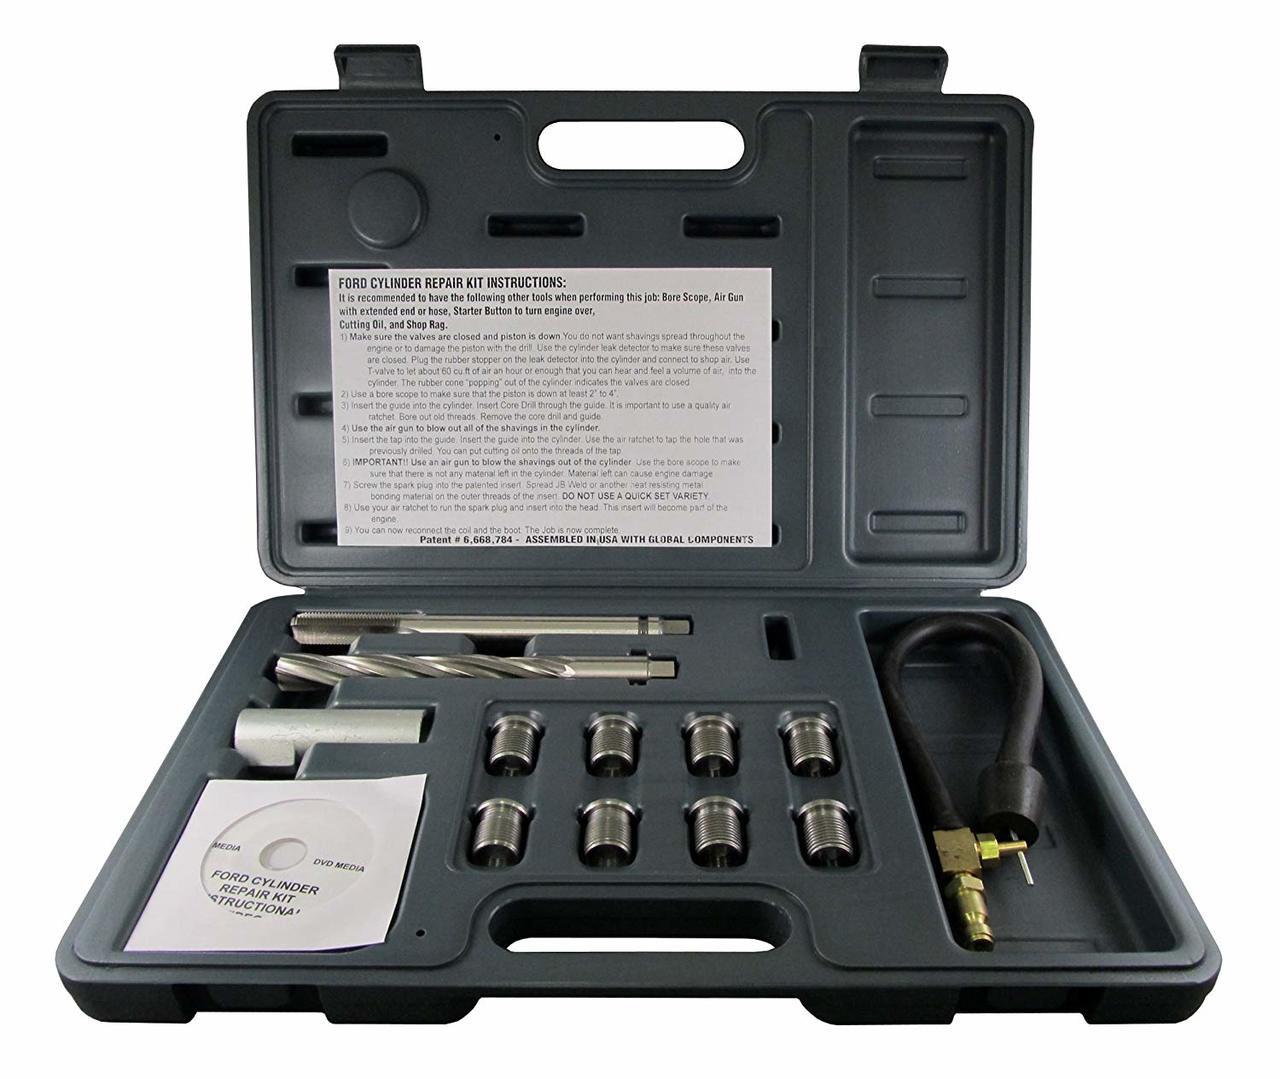 Cal Van Tools 38900 Two Valve Ford Triton Spark Plug Thread Repair Kit